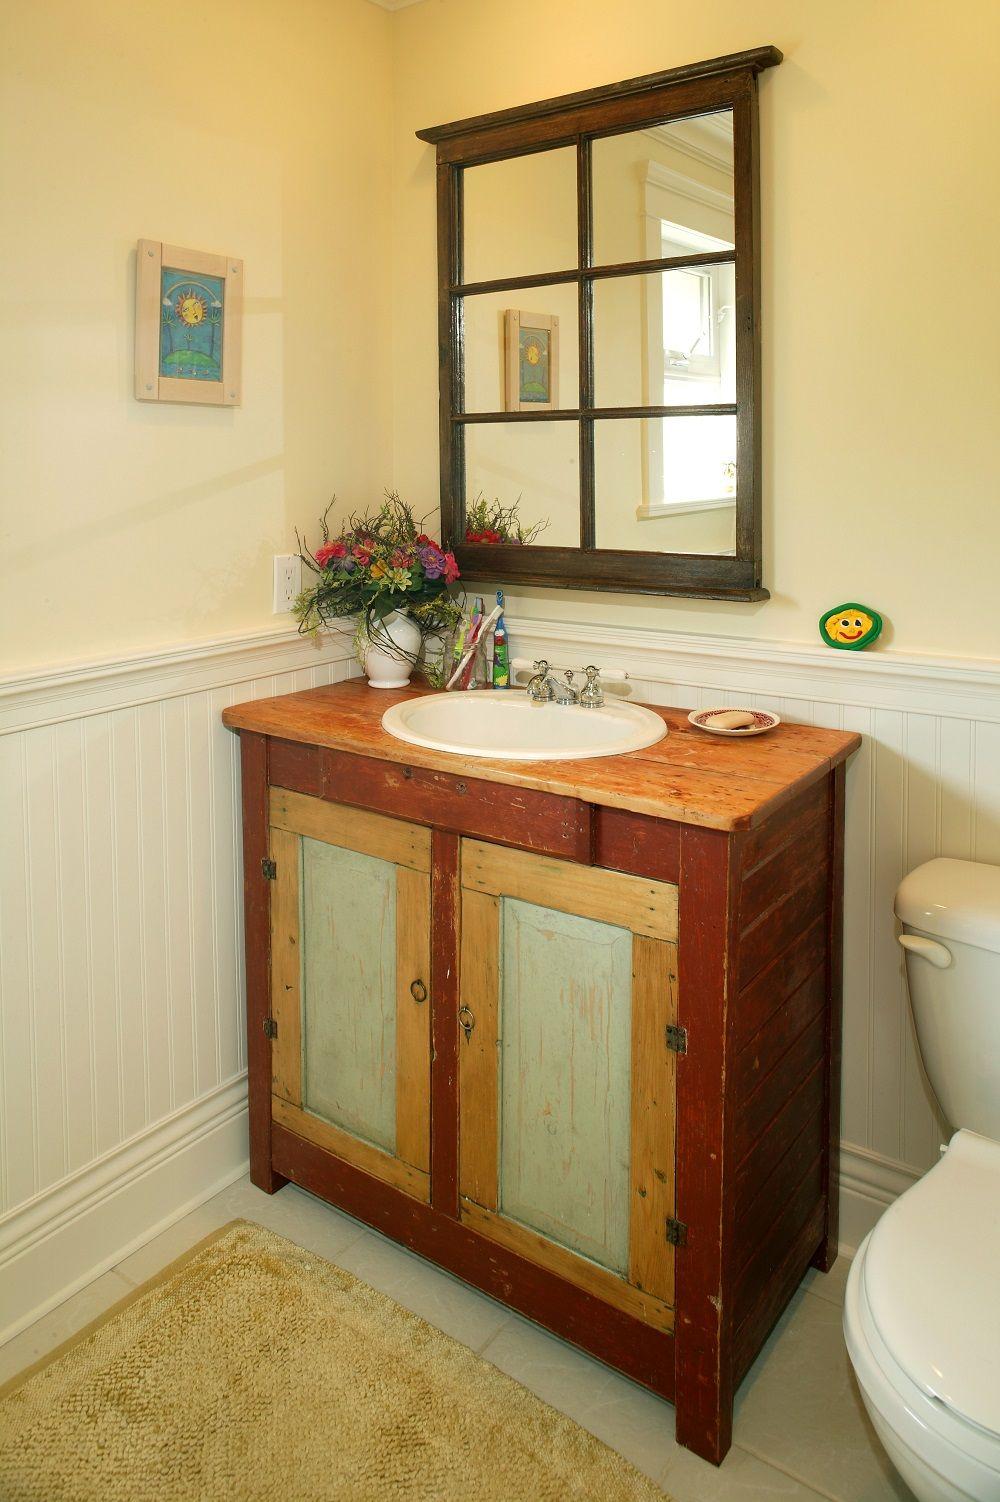 Bathroom Remodel Cost Estimator | White baseboards, Remodeling costs ...